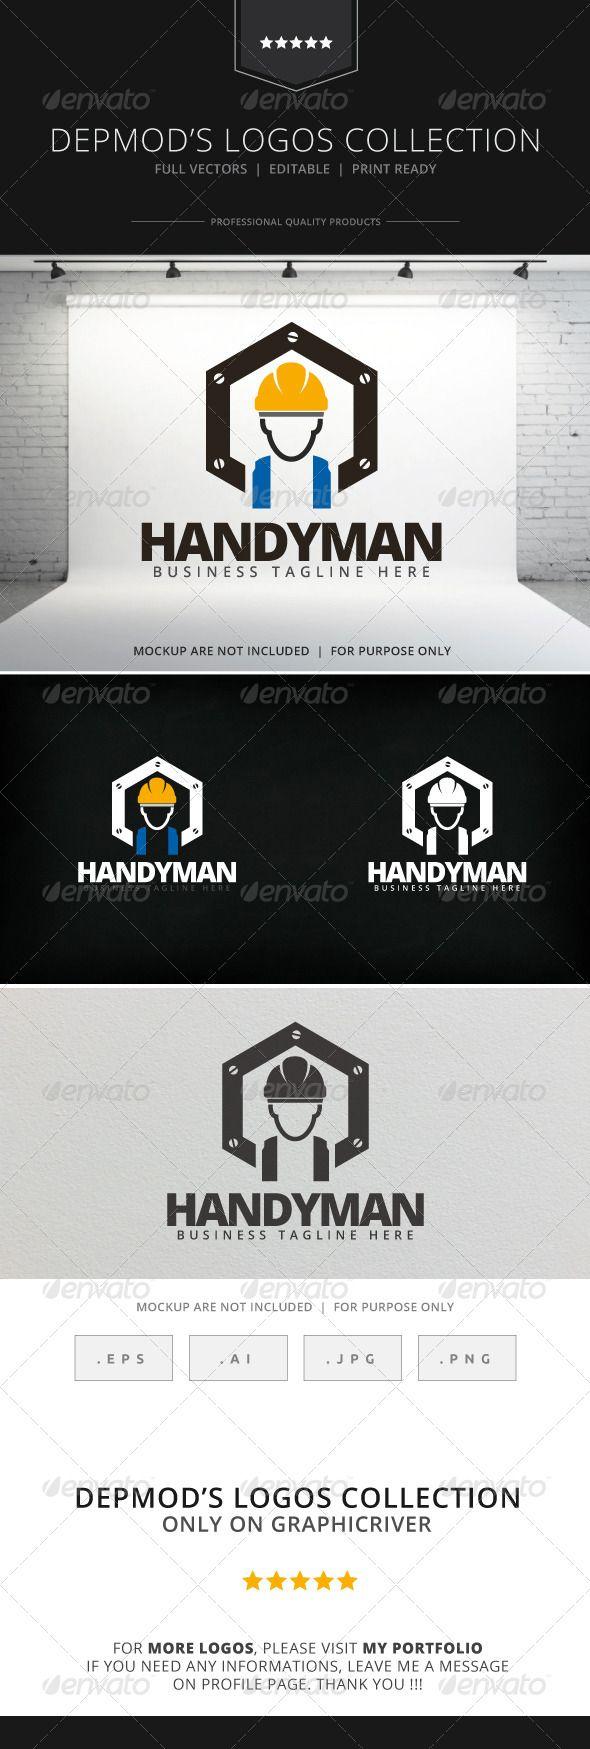 Handyman Logo u2014 Vector EPS #identity #business u2022 Available here u2192 https://graphicriver.net/item/handyman-logo/8017021?ref=pxcr